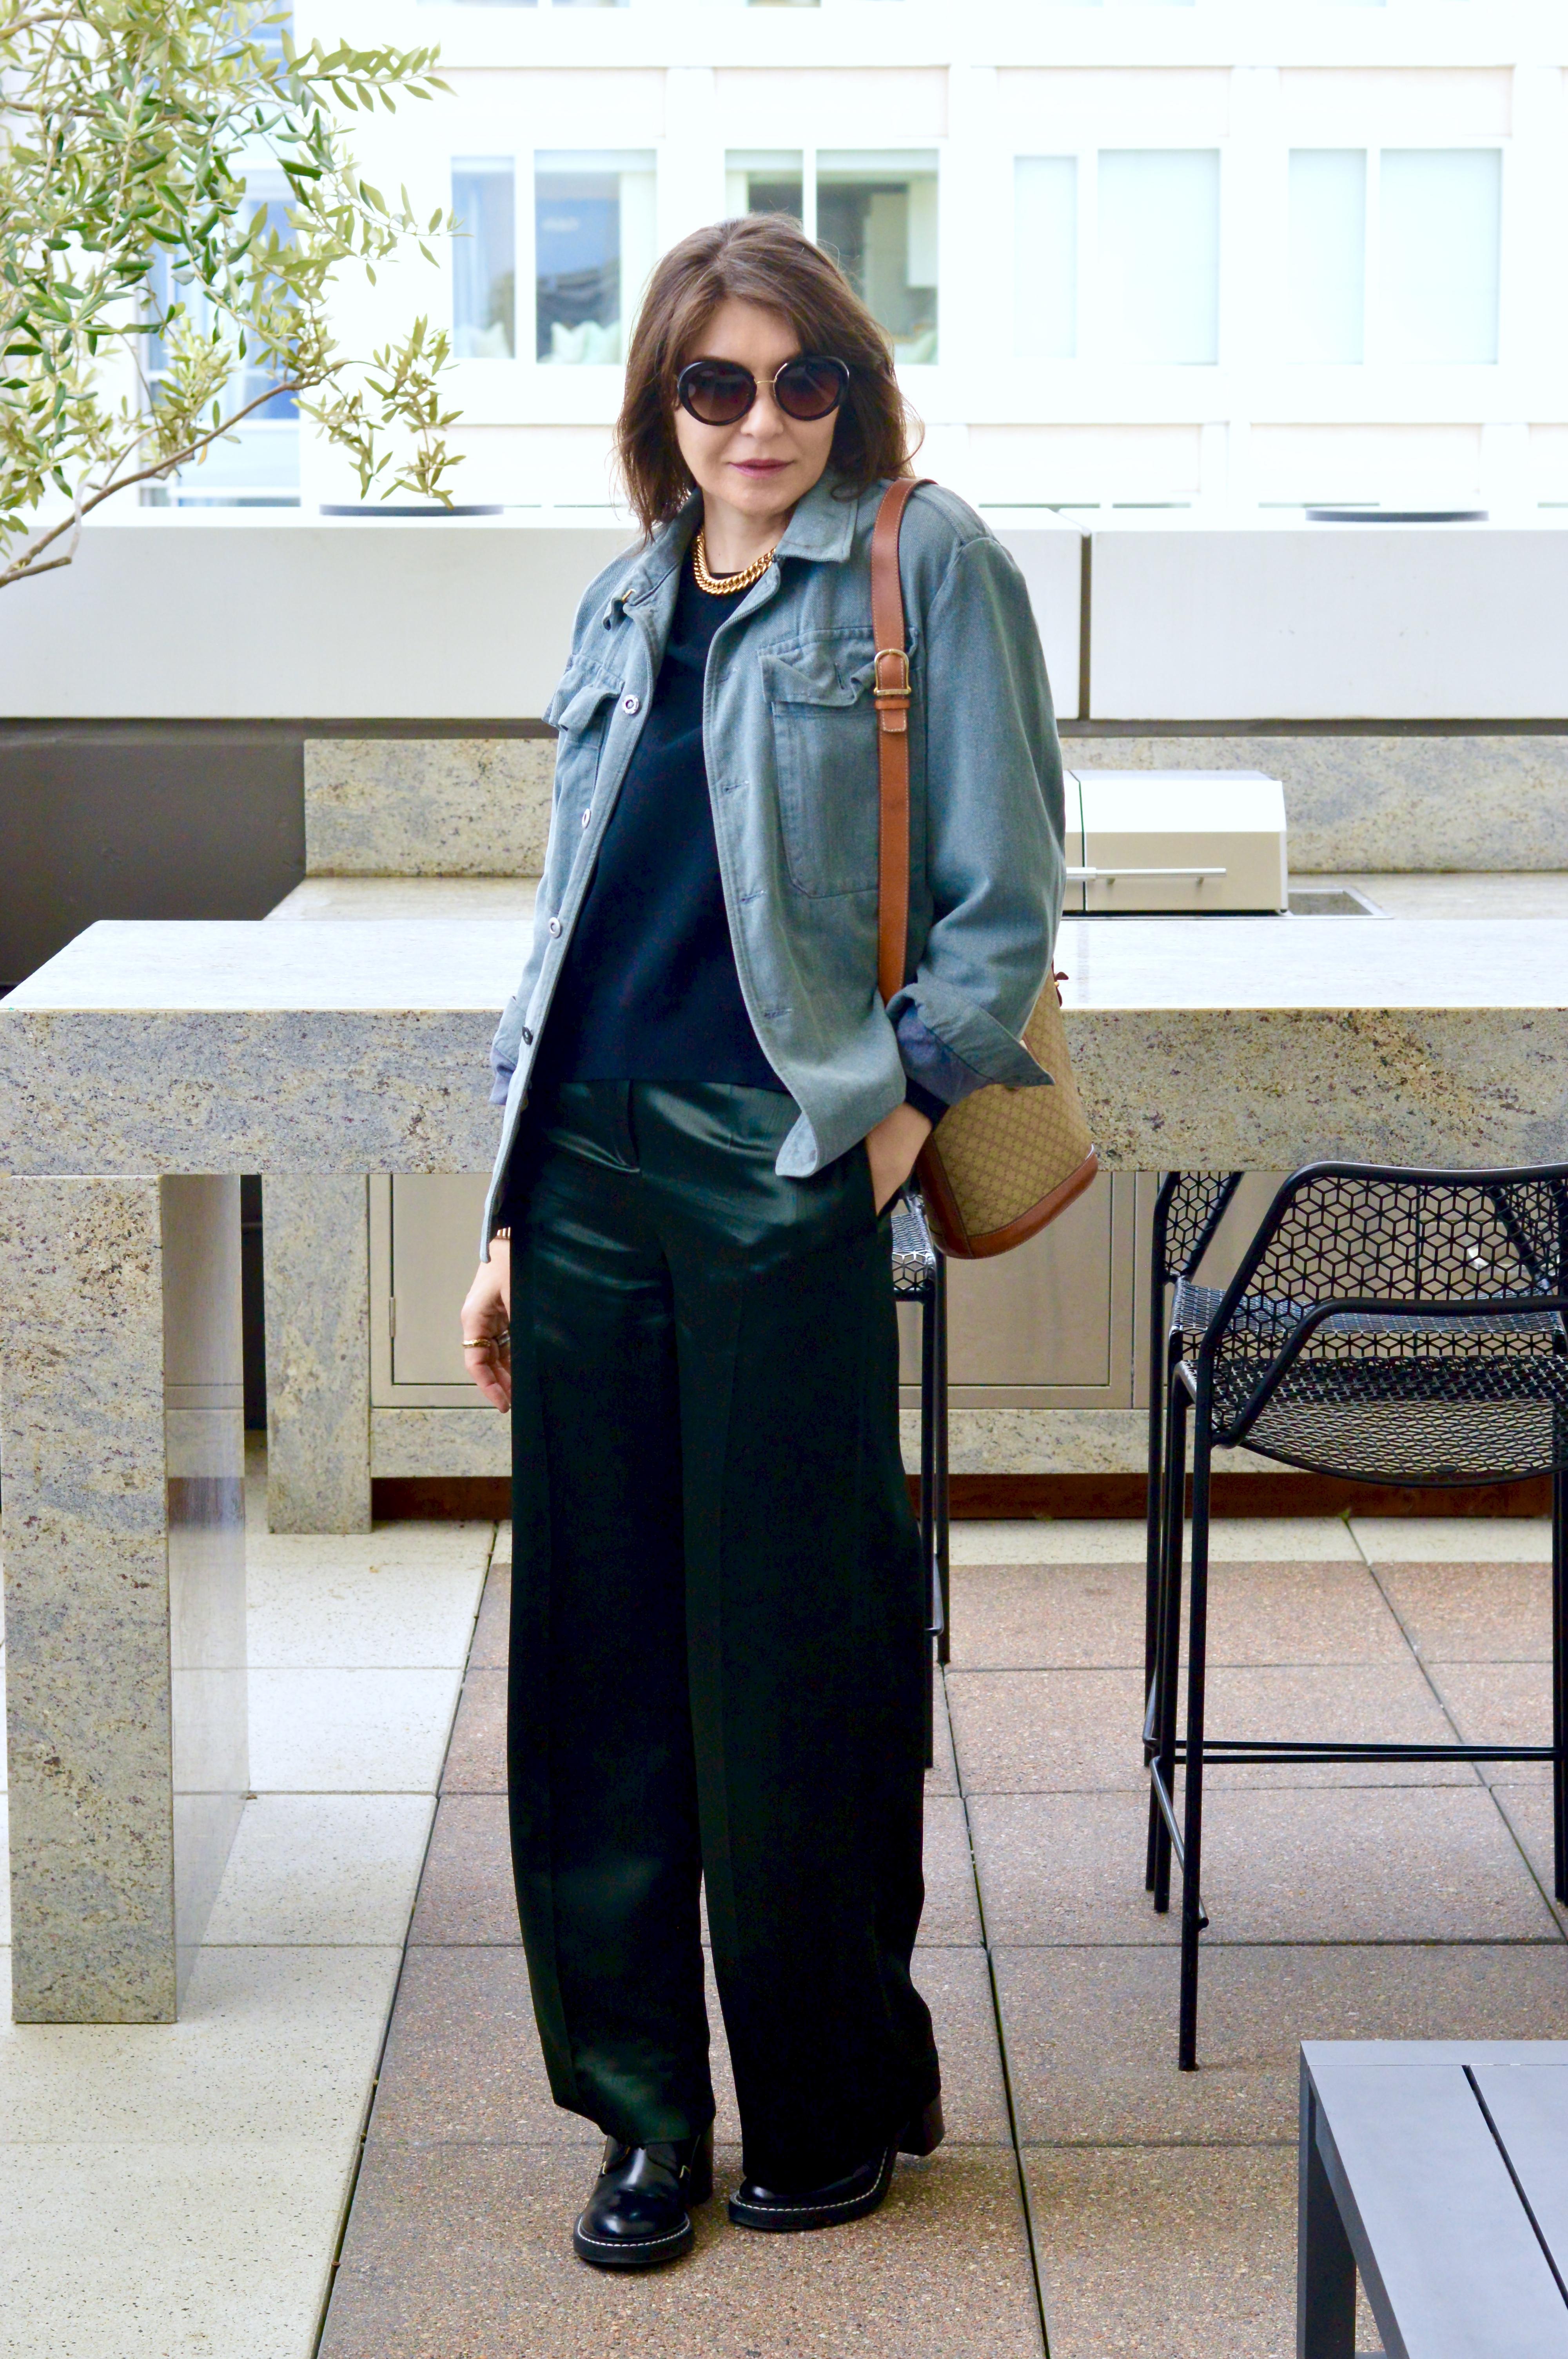 Vintage denim jacket and satin pant.